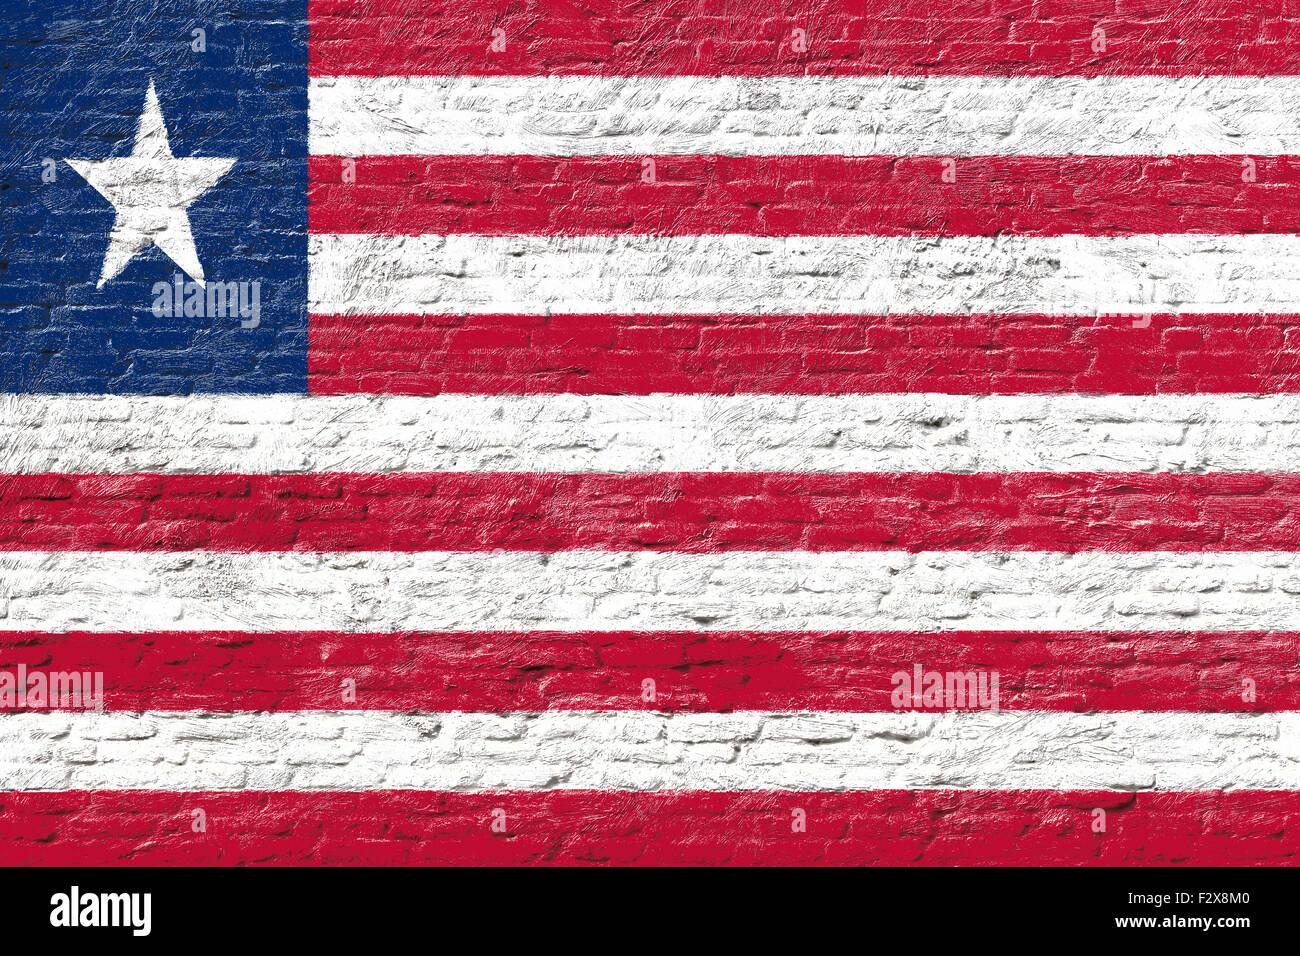 Liberia - National flag on Brick wall Stock Photo